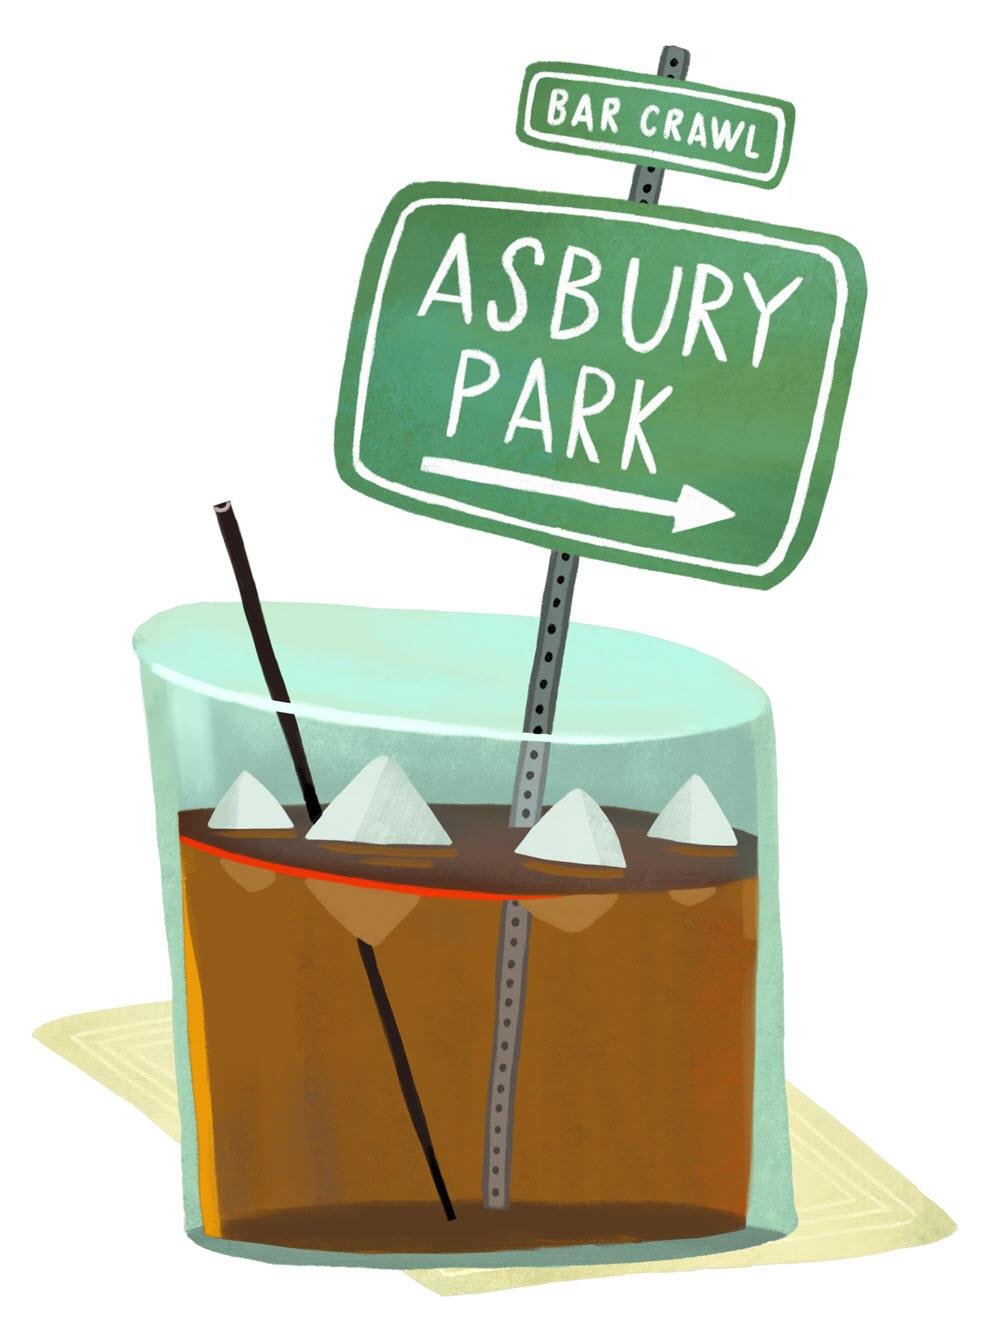 Asbury Park Bar Crawl - MH791